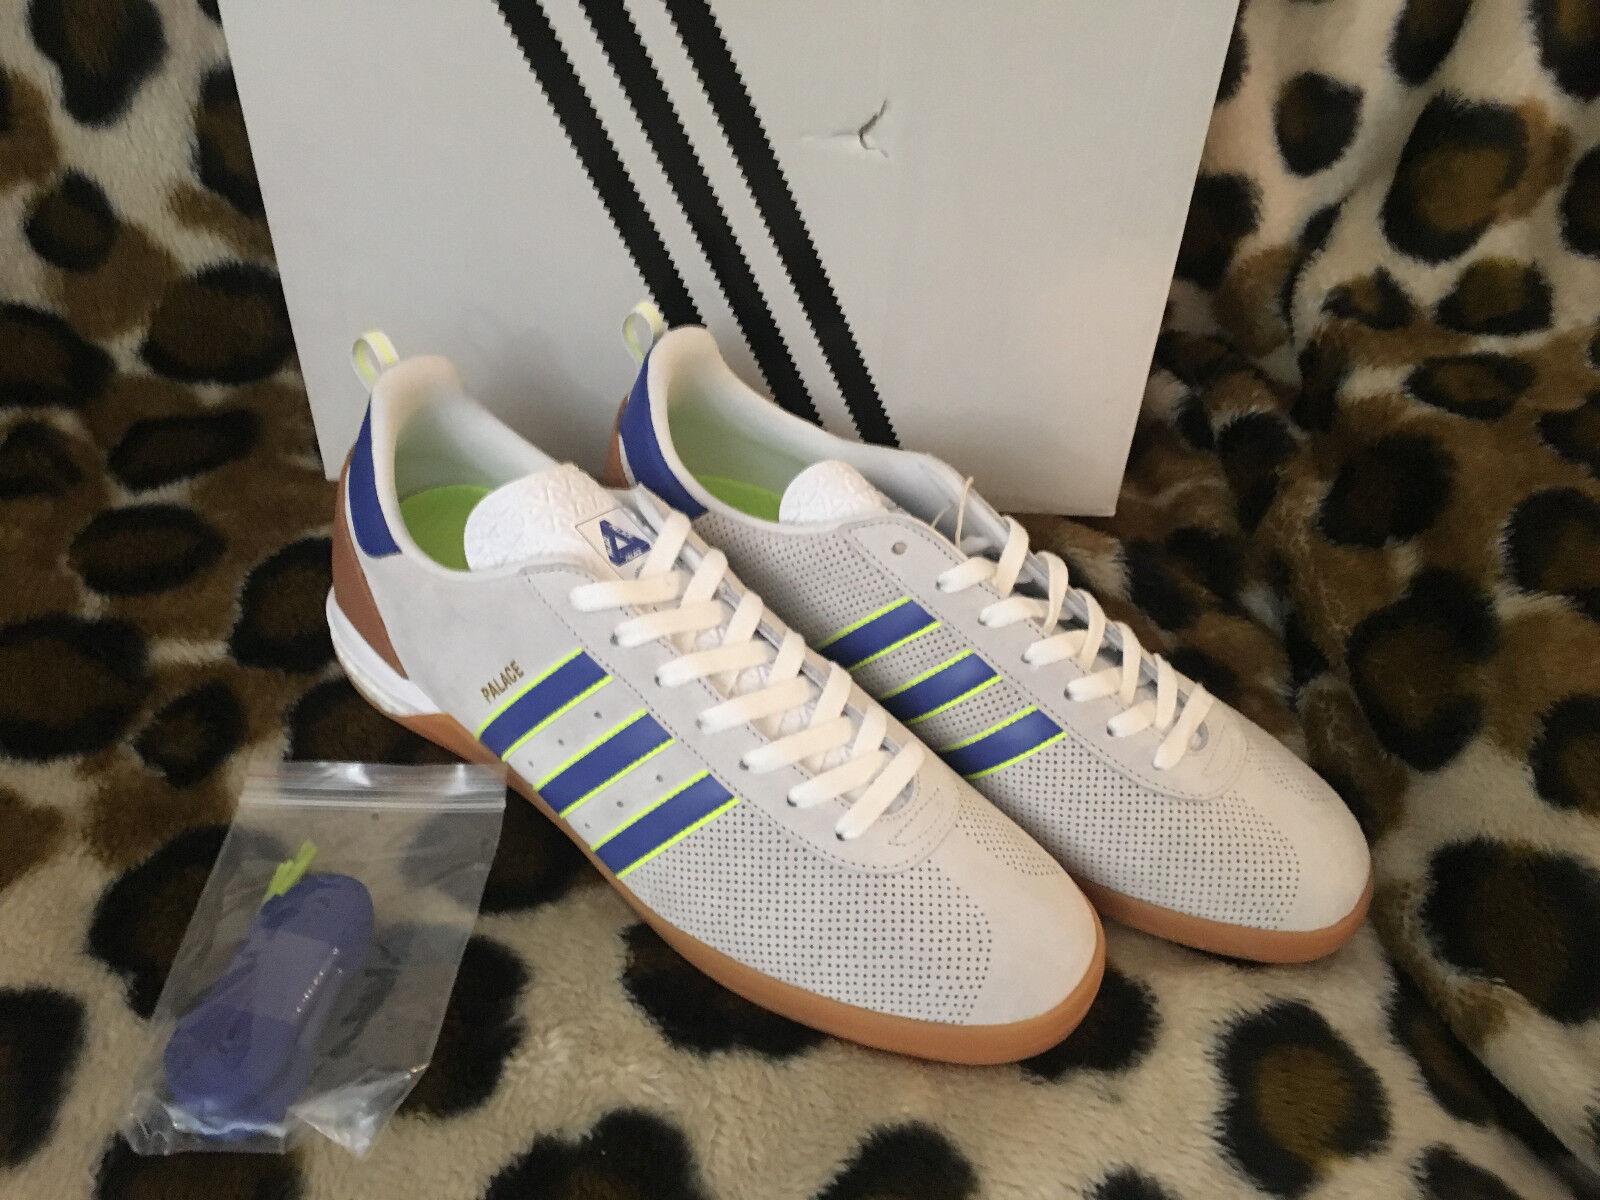 New Adidas X Palace Indoor- CG3364 mens sz 11